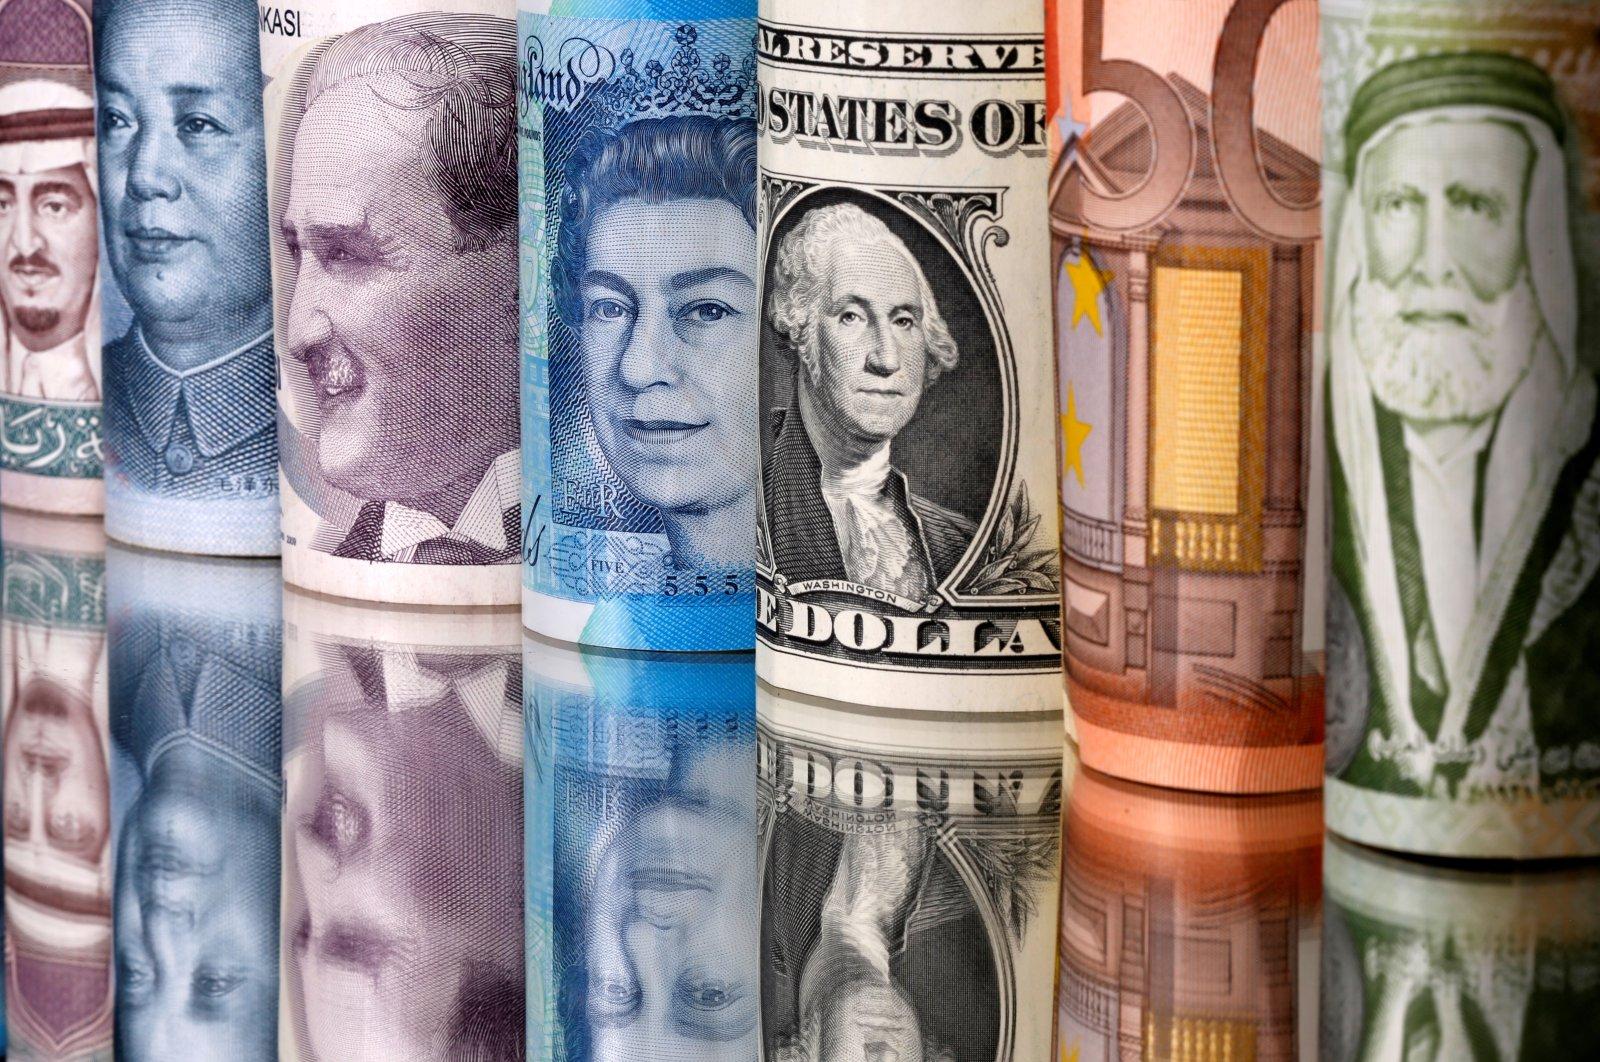 (From L to R) Saudi riyal, Chinese yuan, Turkish lira, British pound, U.S. dollar, euro and Jordanian dinar banknotes are seen in this illustration, Jan. 6, 2020. (Reuters Photo)